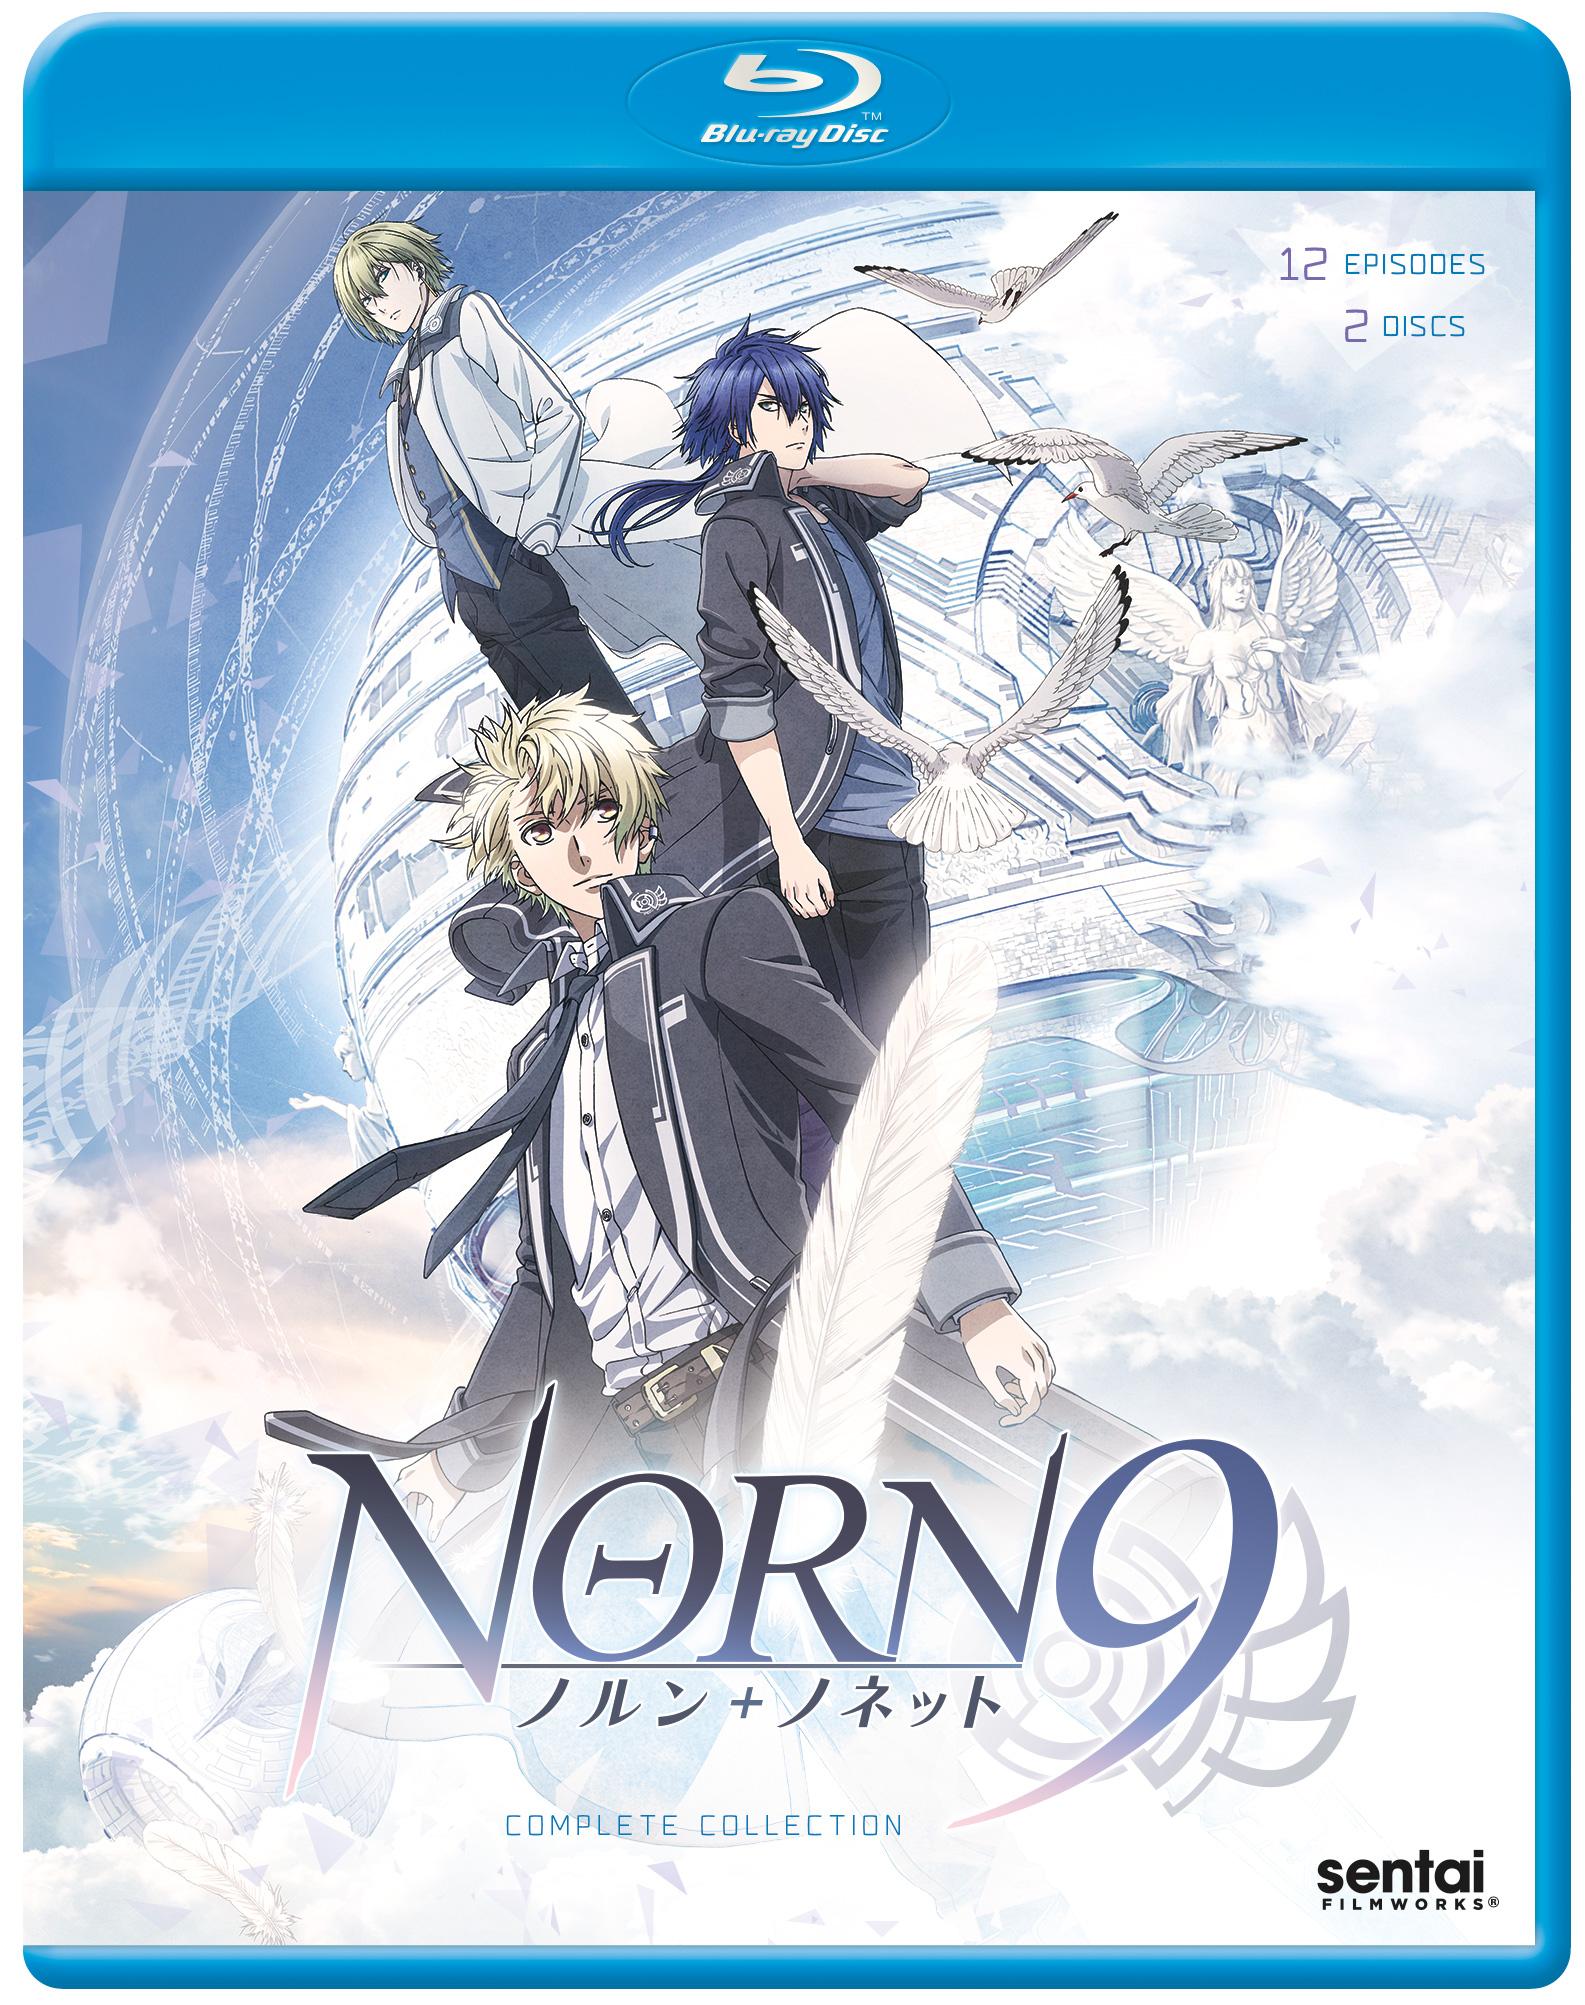 Norn9 Blu-ray